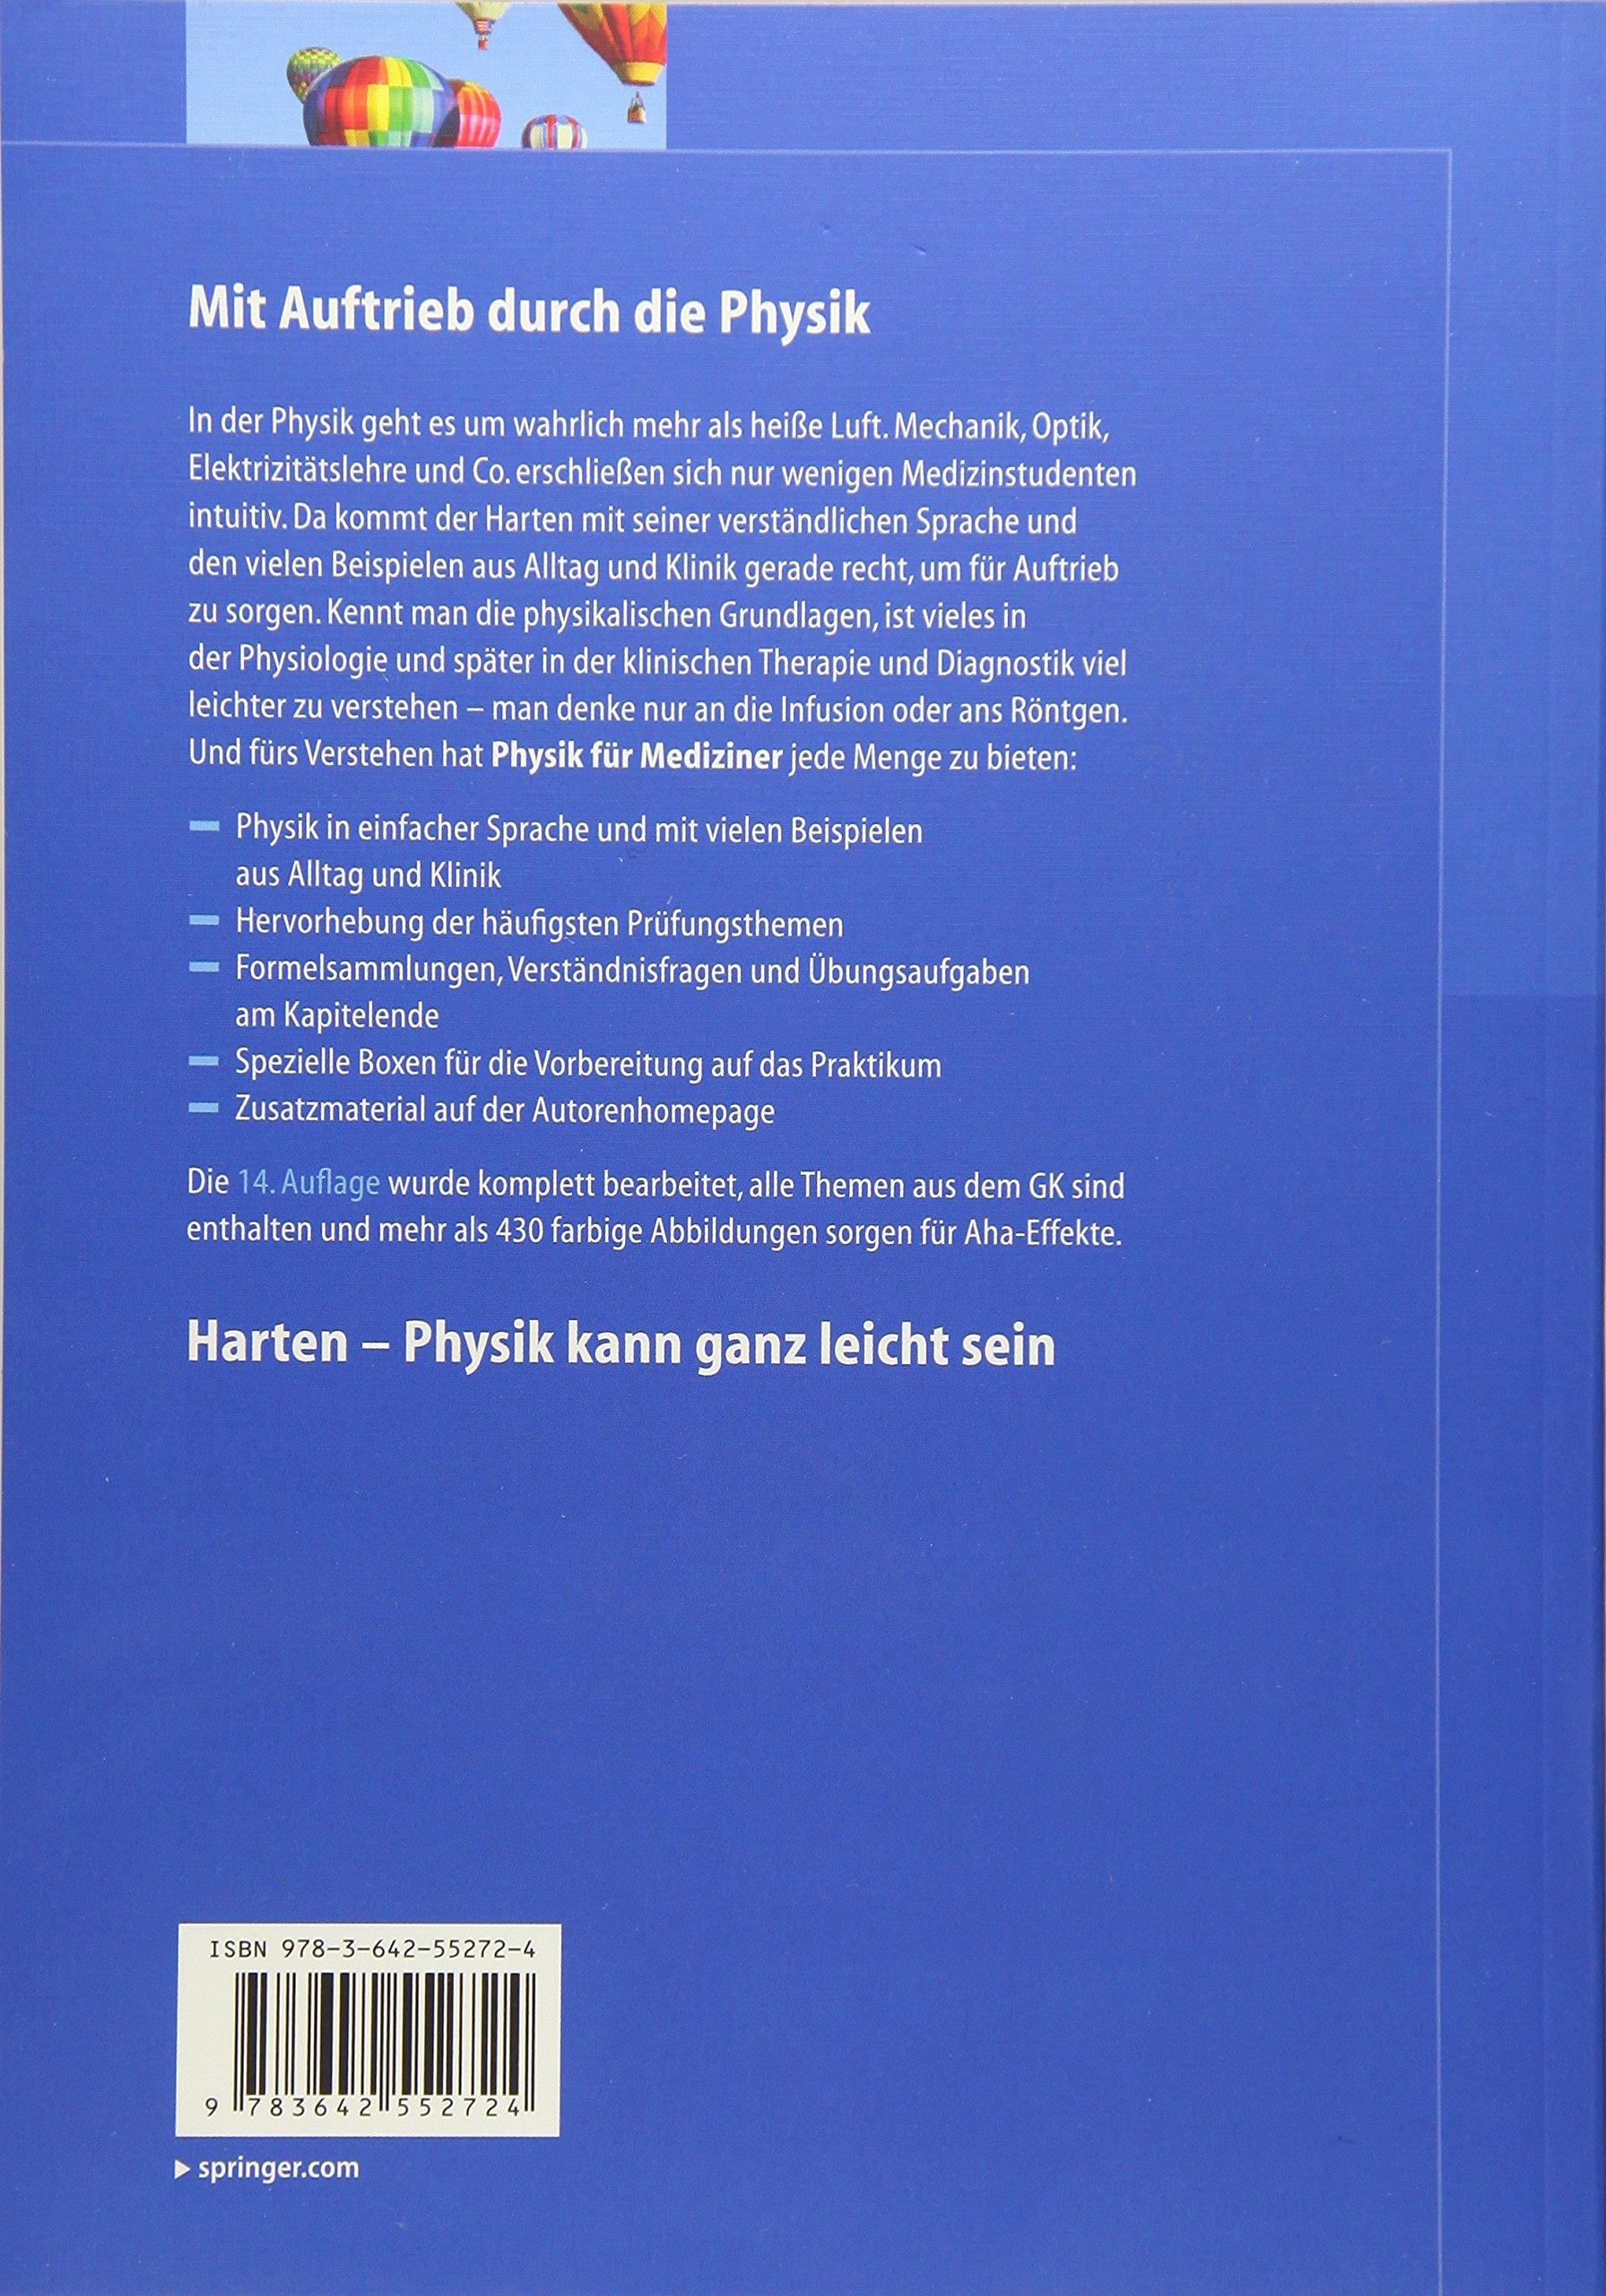 Physik für Mediziner (Springer-Lehrbuch): Amazon.de: Ulrich Harten ...